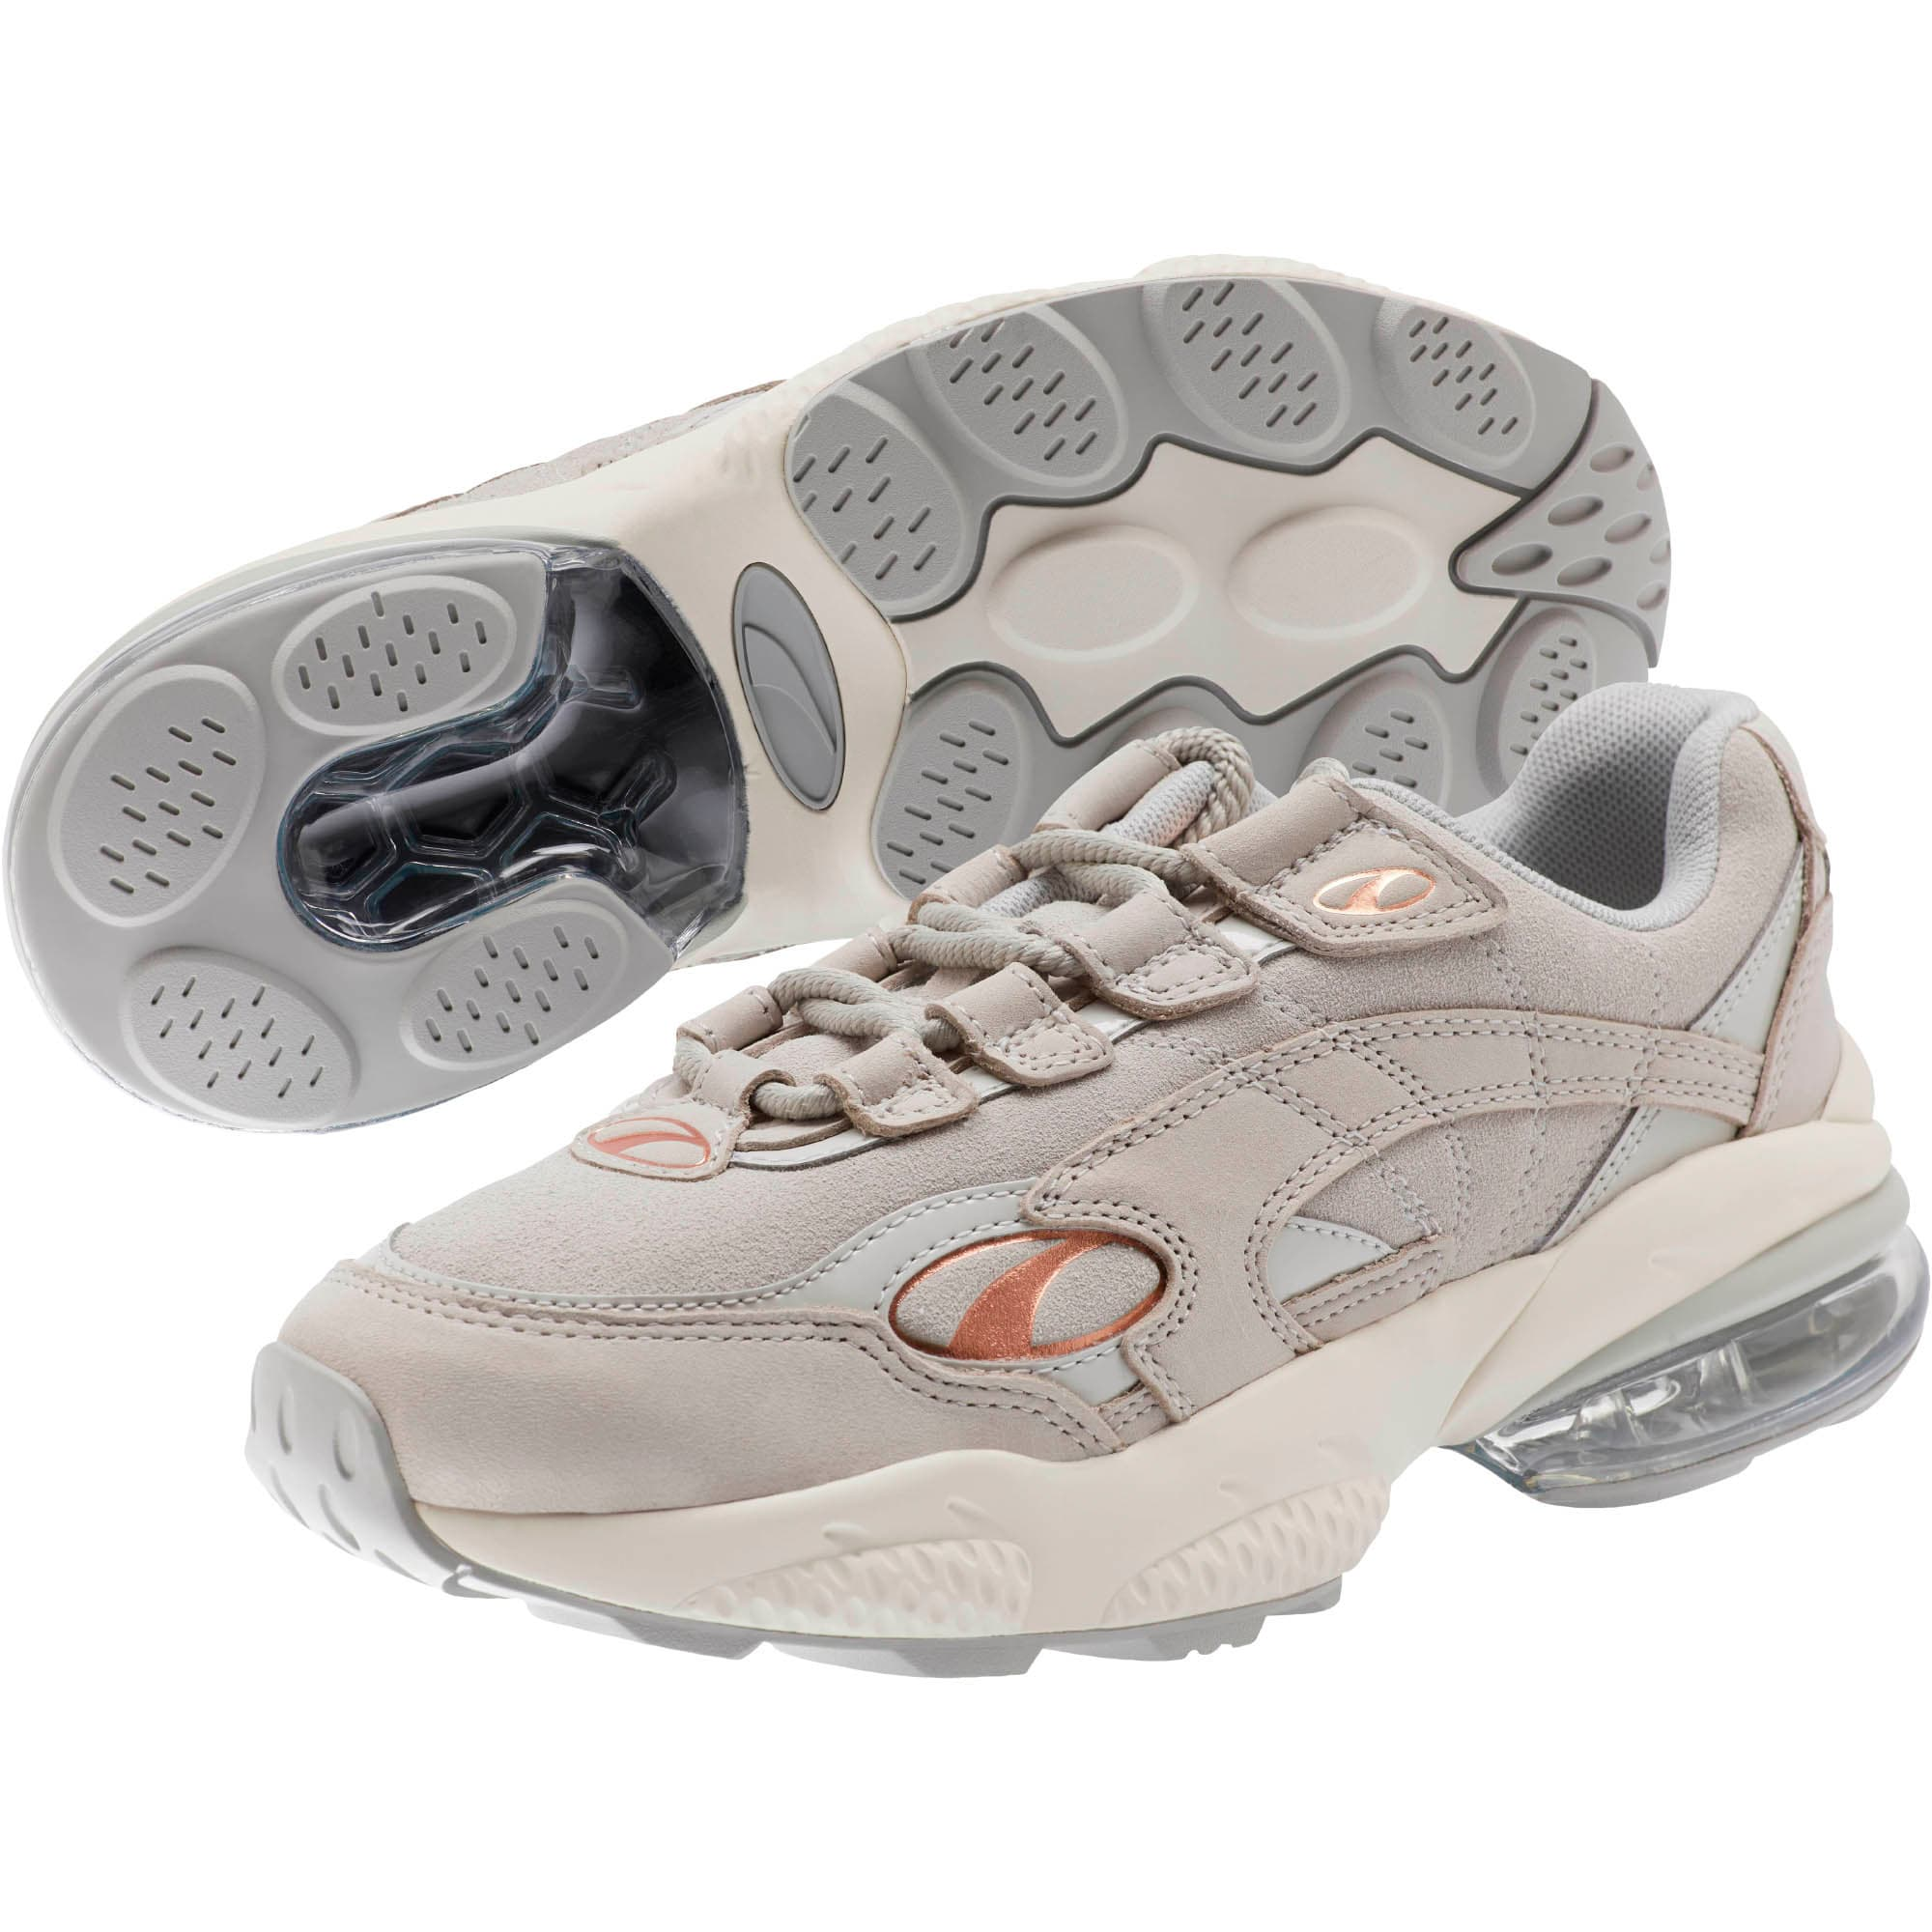 Thumbnail 2 of CELL Venom Patent Women's Sneakers, Gray Violet-Marshmallow, medium